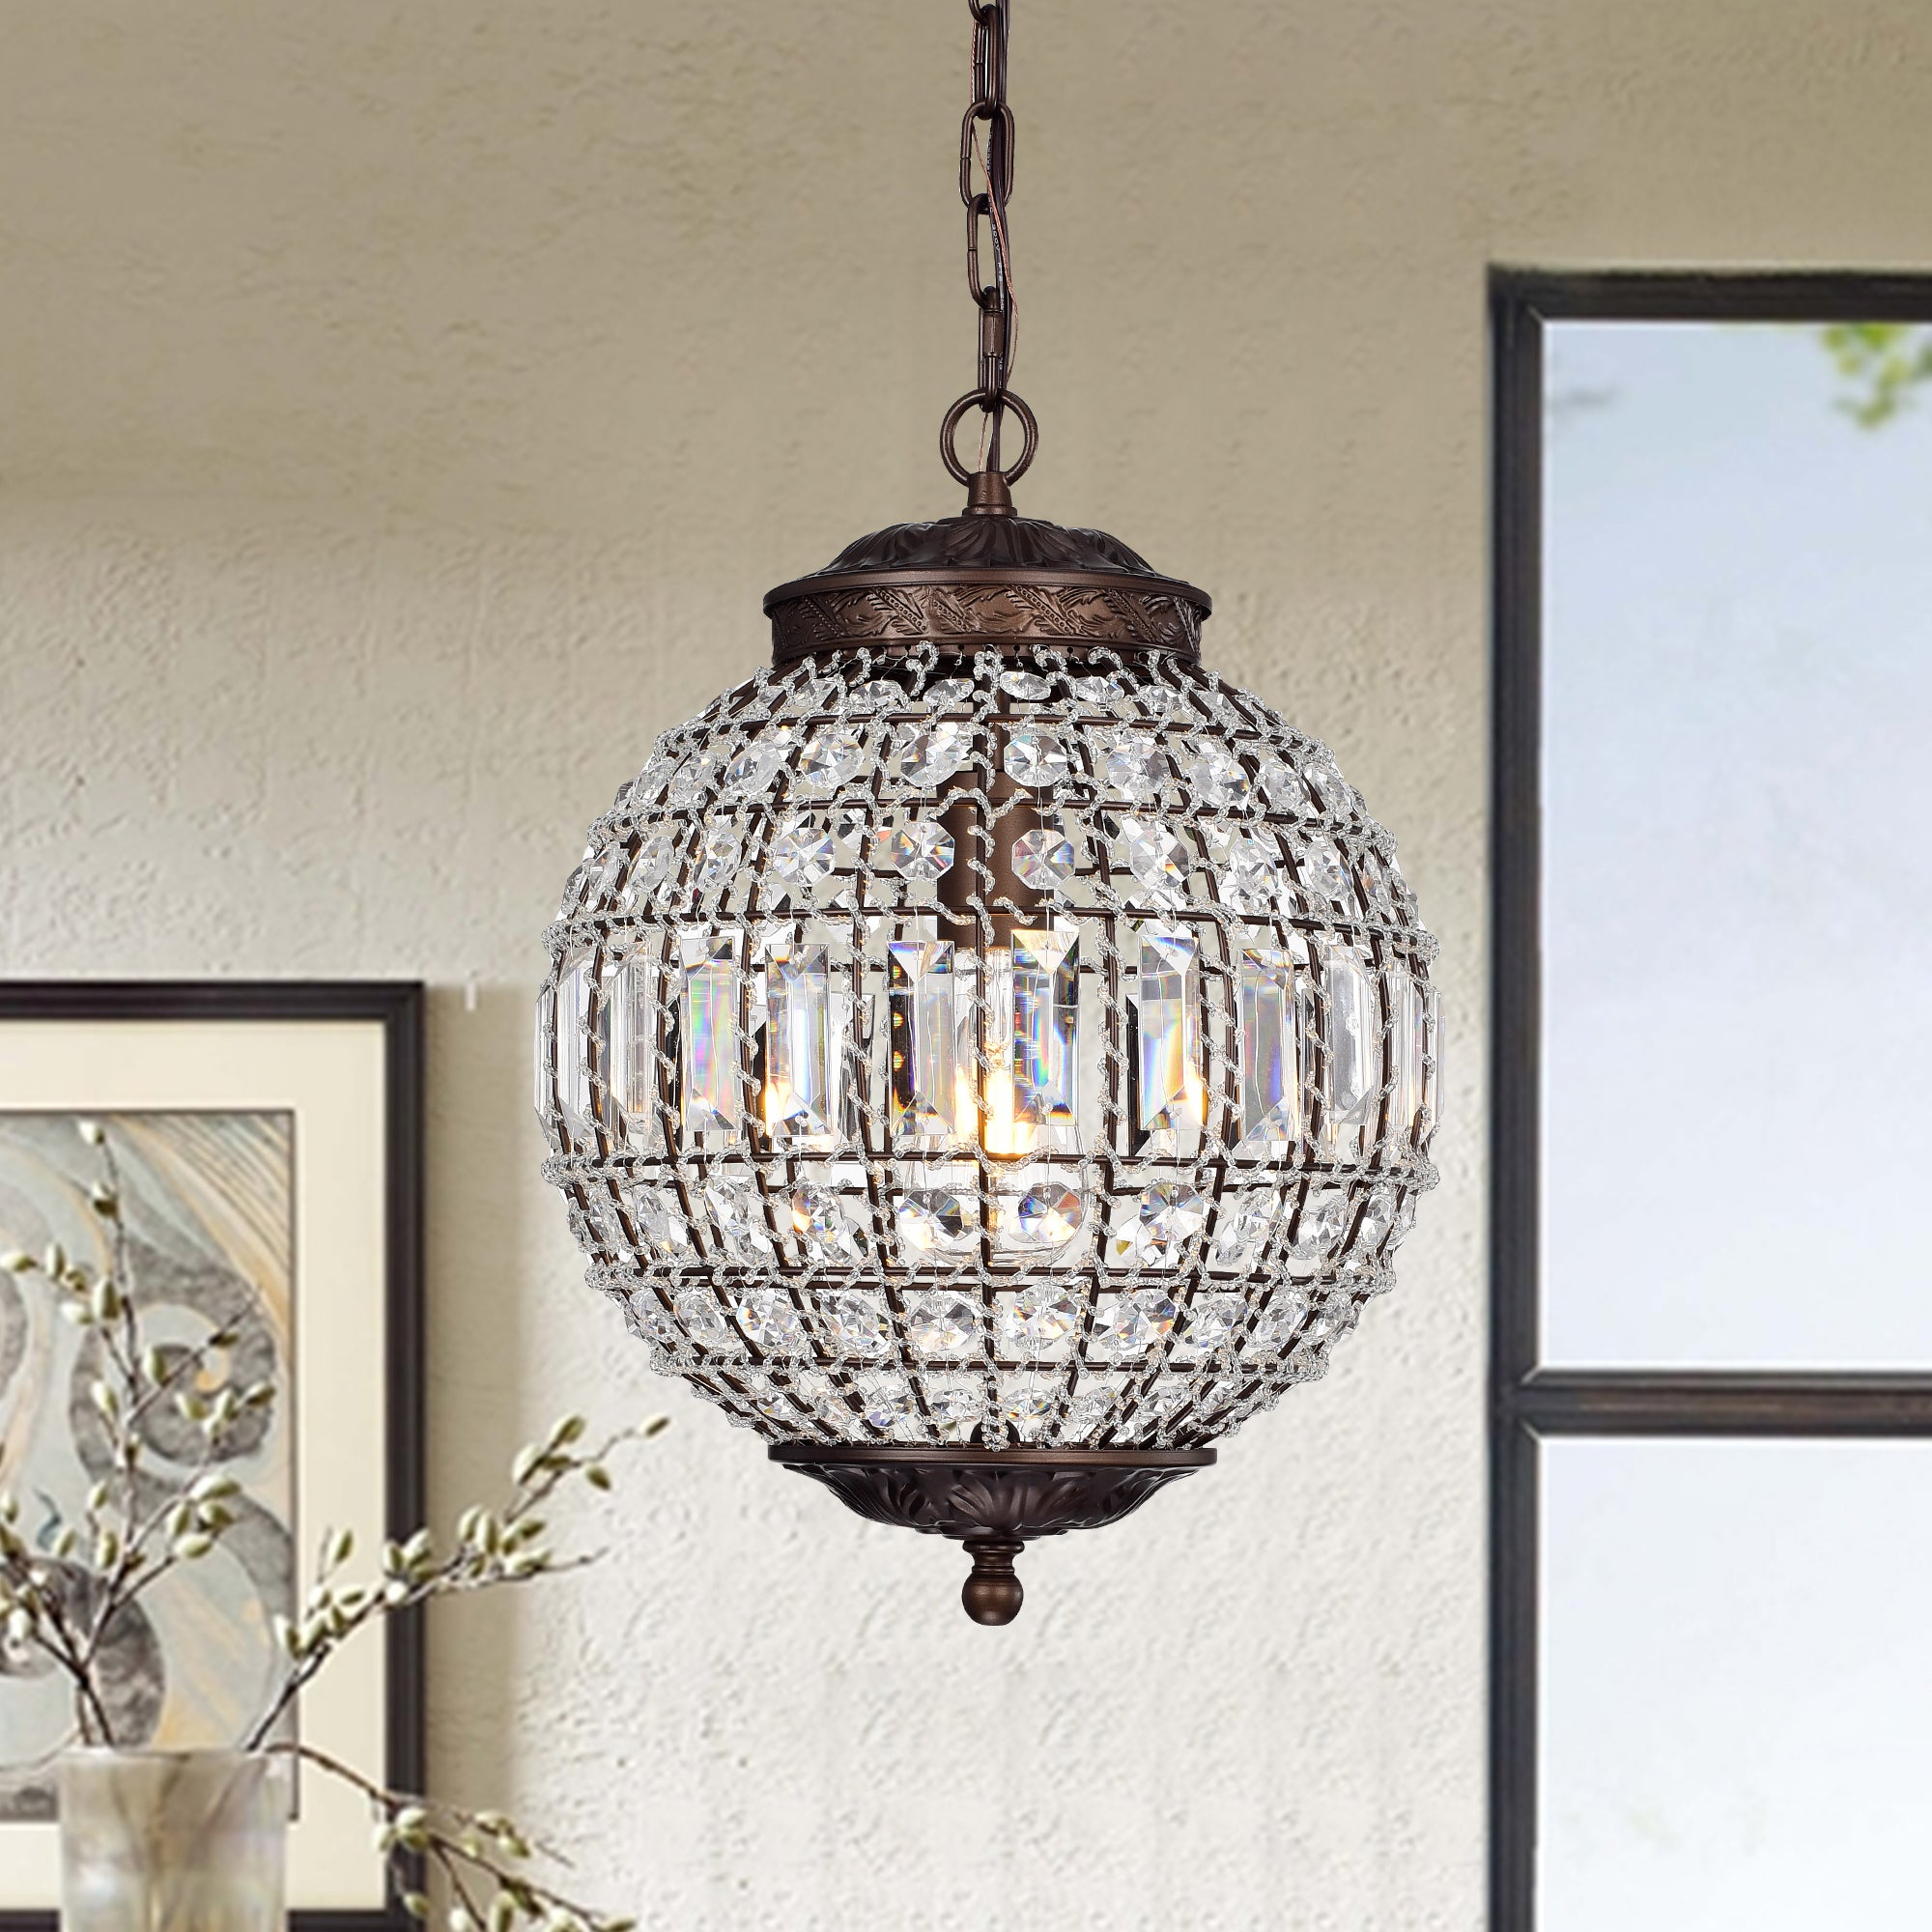 Shop Black Friday Deals On Mordae Antique Bronze 12 Inch Crystal Globe 1 Light Pendant Lamp Overstock 20289114